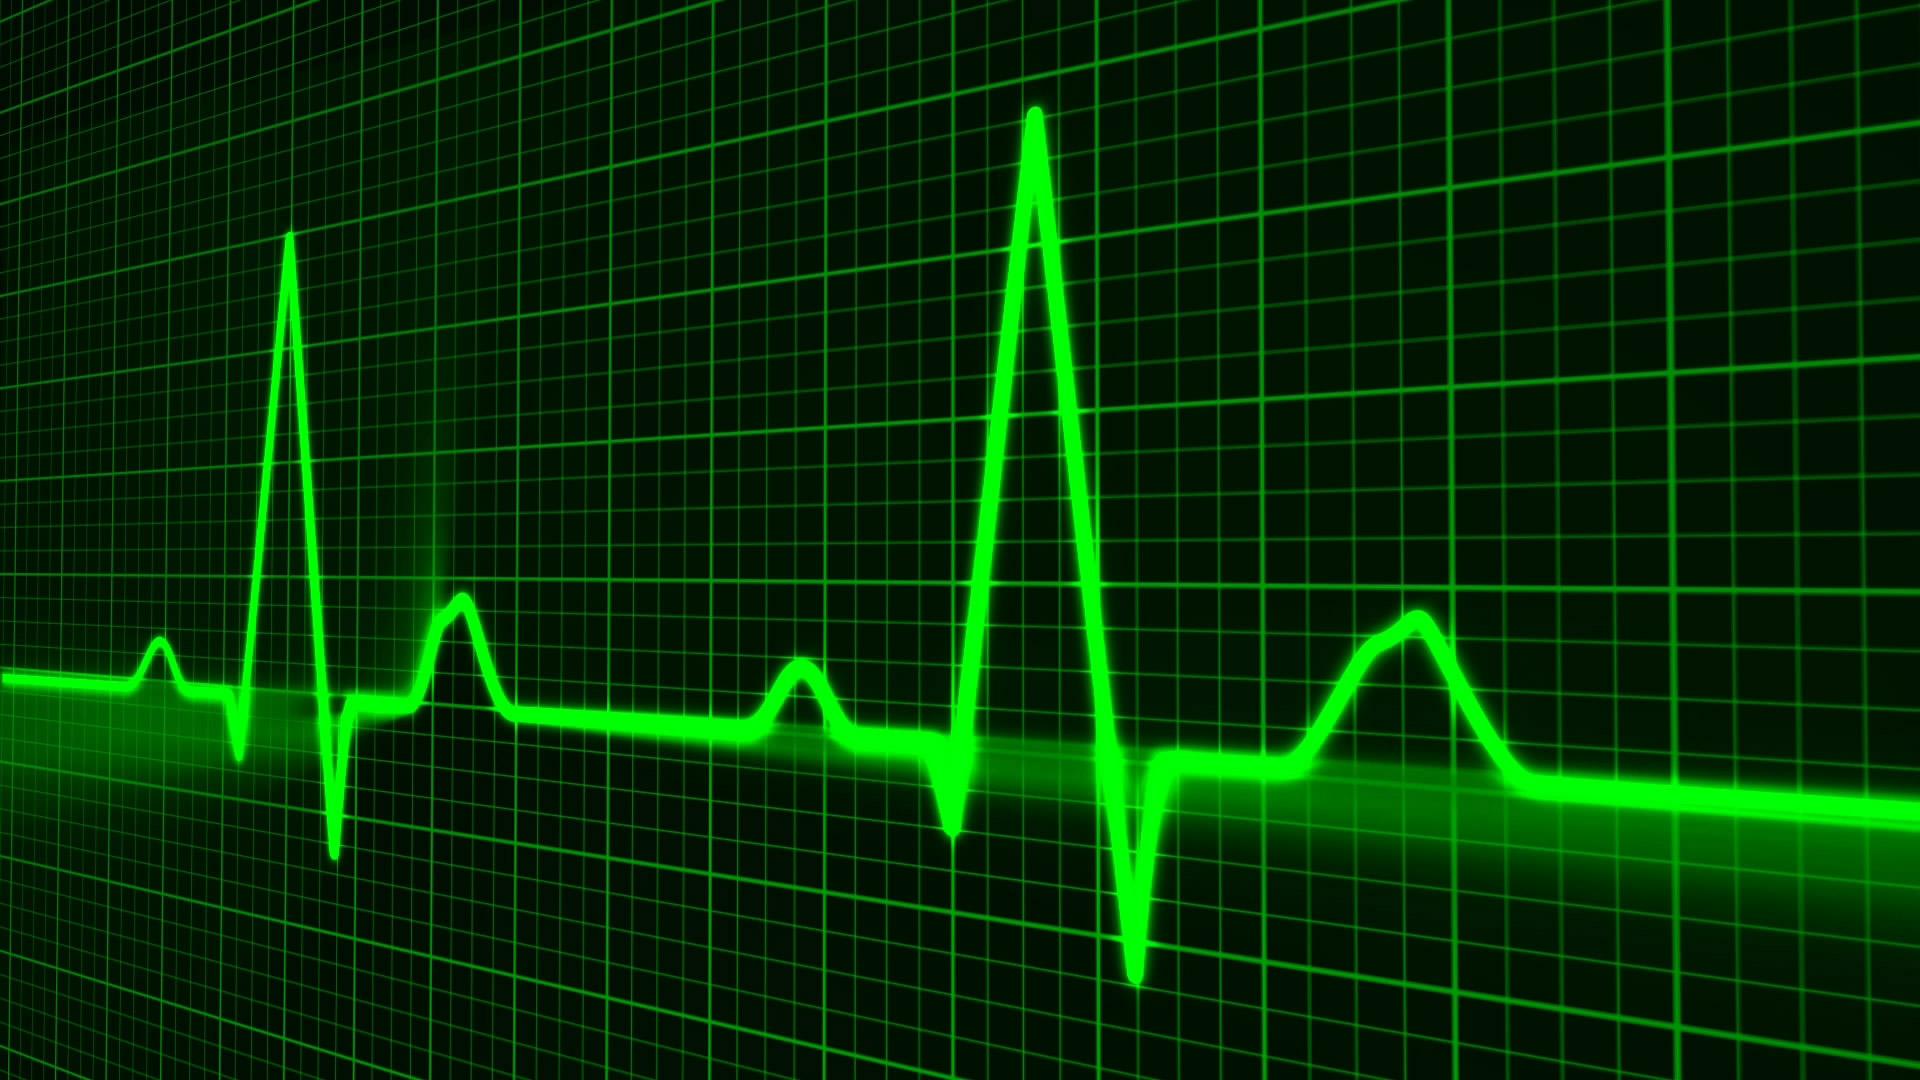 Herzschmerzen oder Herzbeschwerden